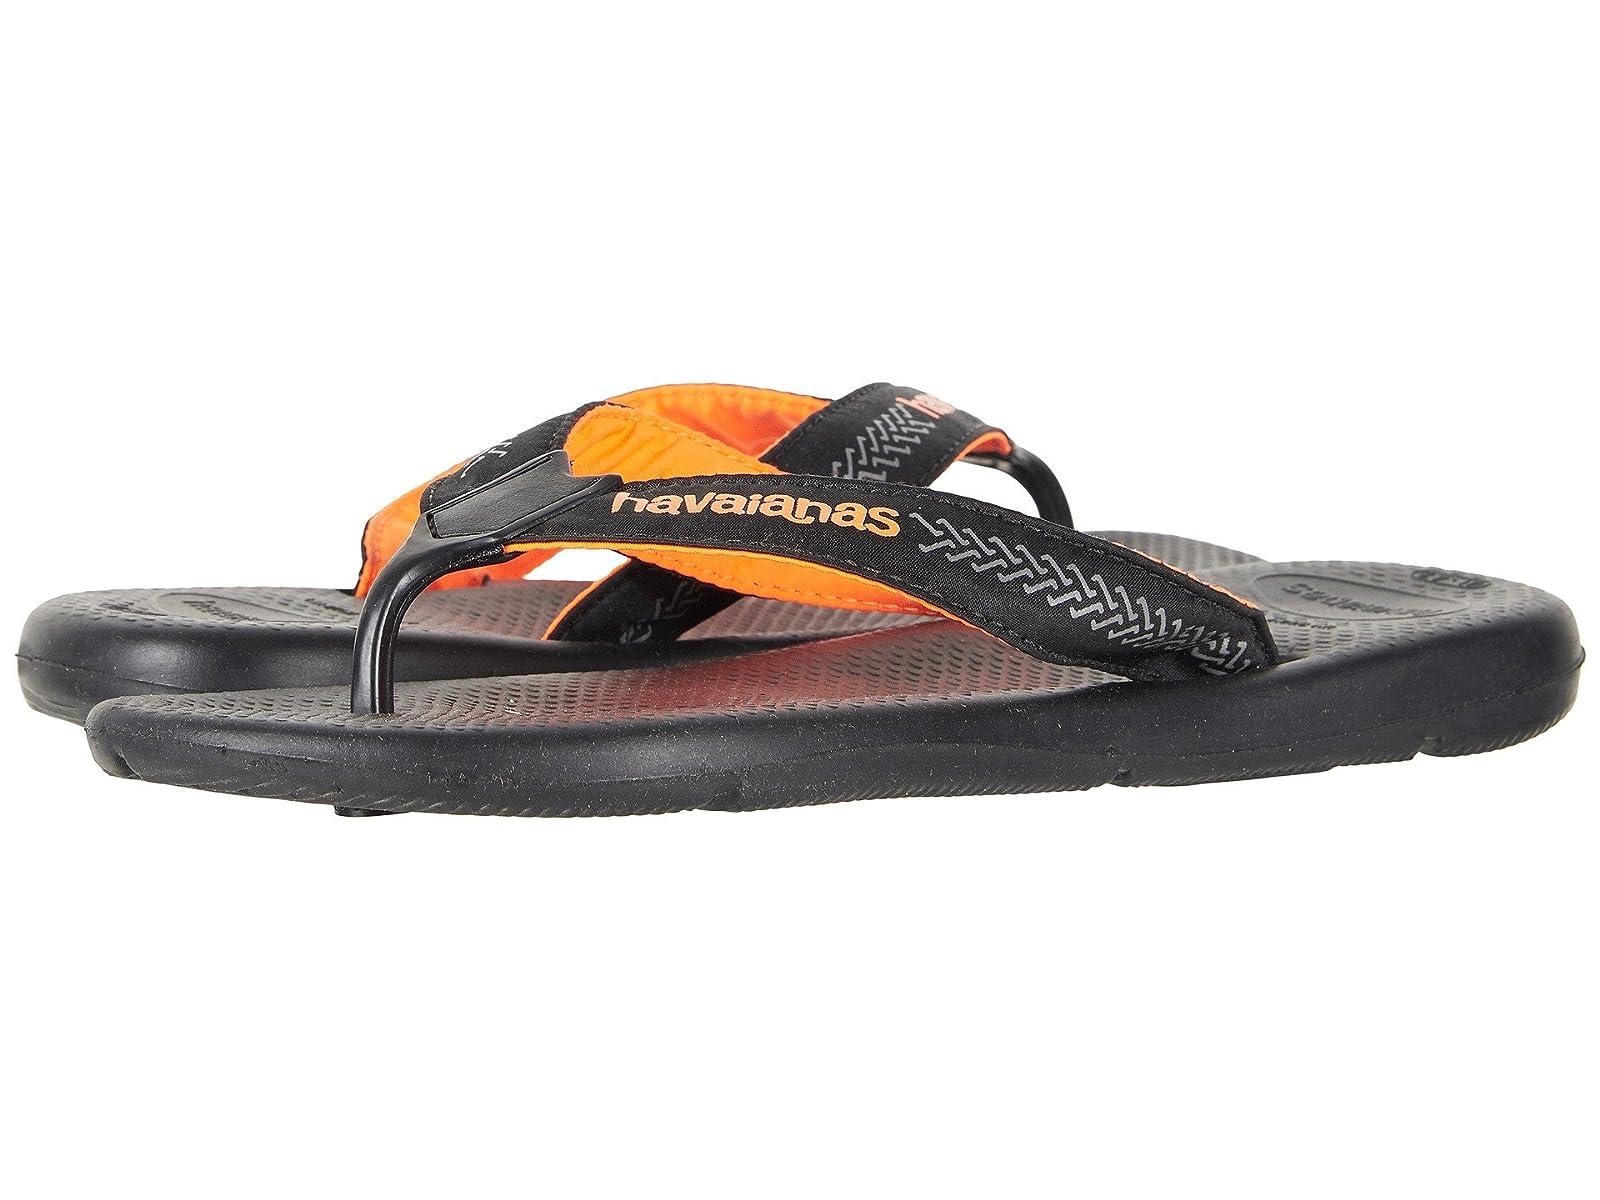 Havaianas Surf Pro Flip FlopsAtmospheric grades have affordable shoes